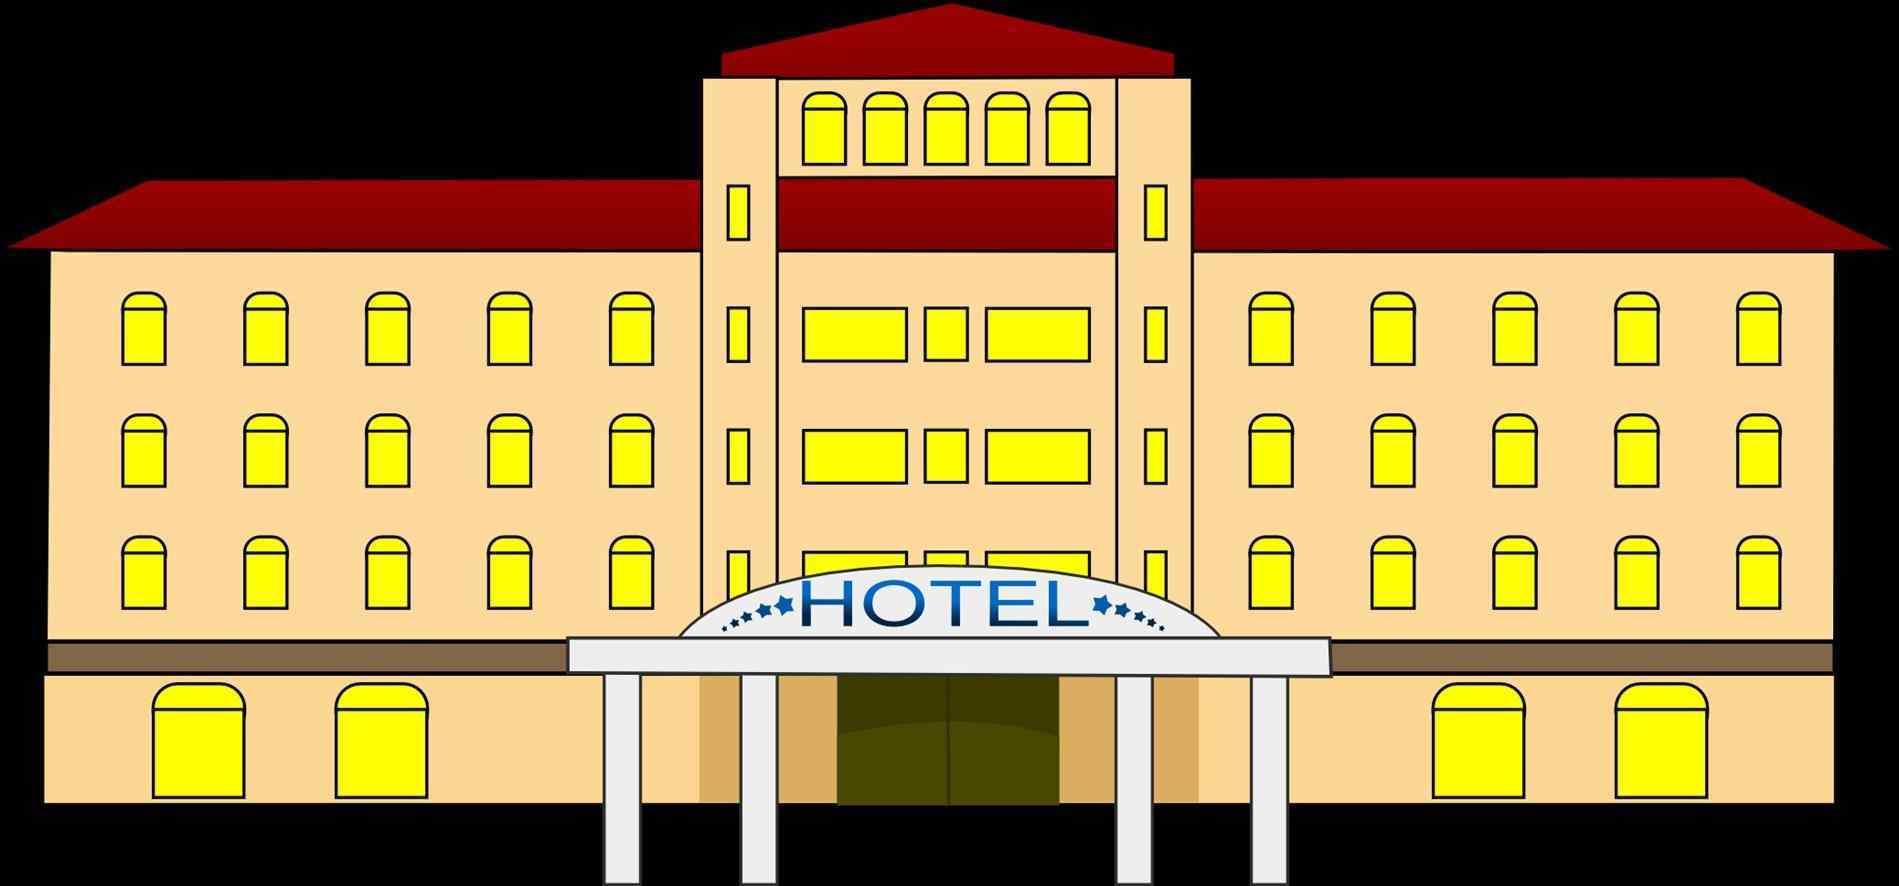 Apartments athelred com clip. Apartment clipart apt